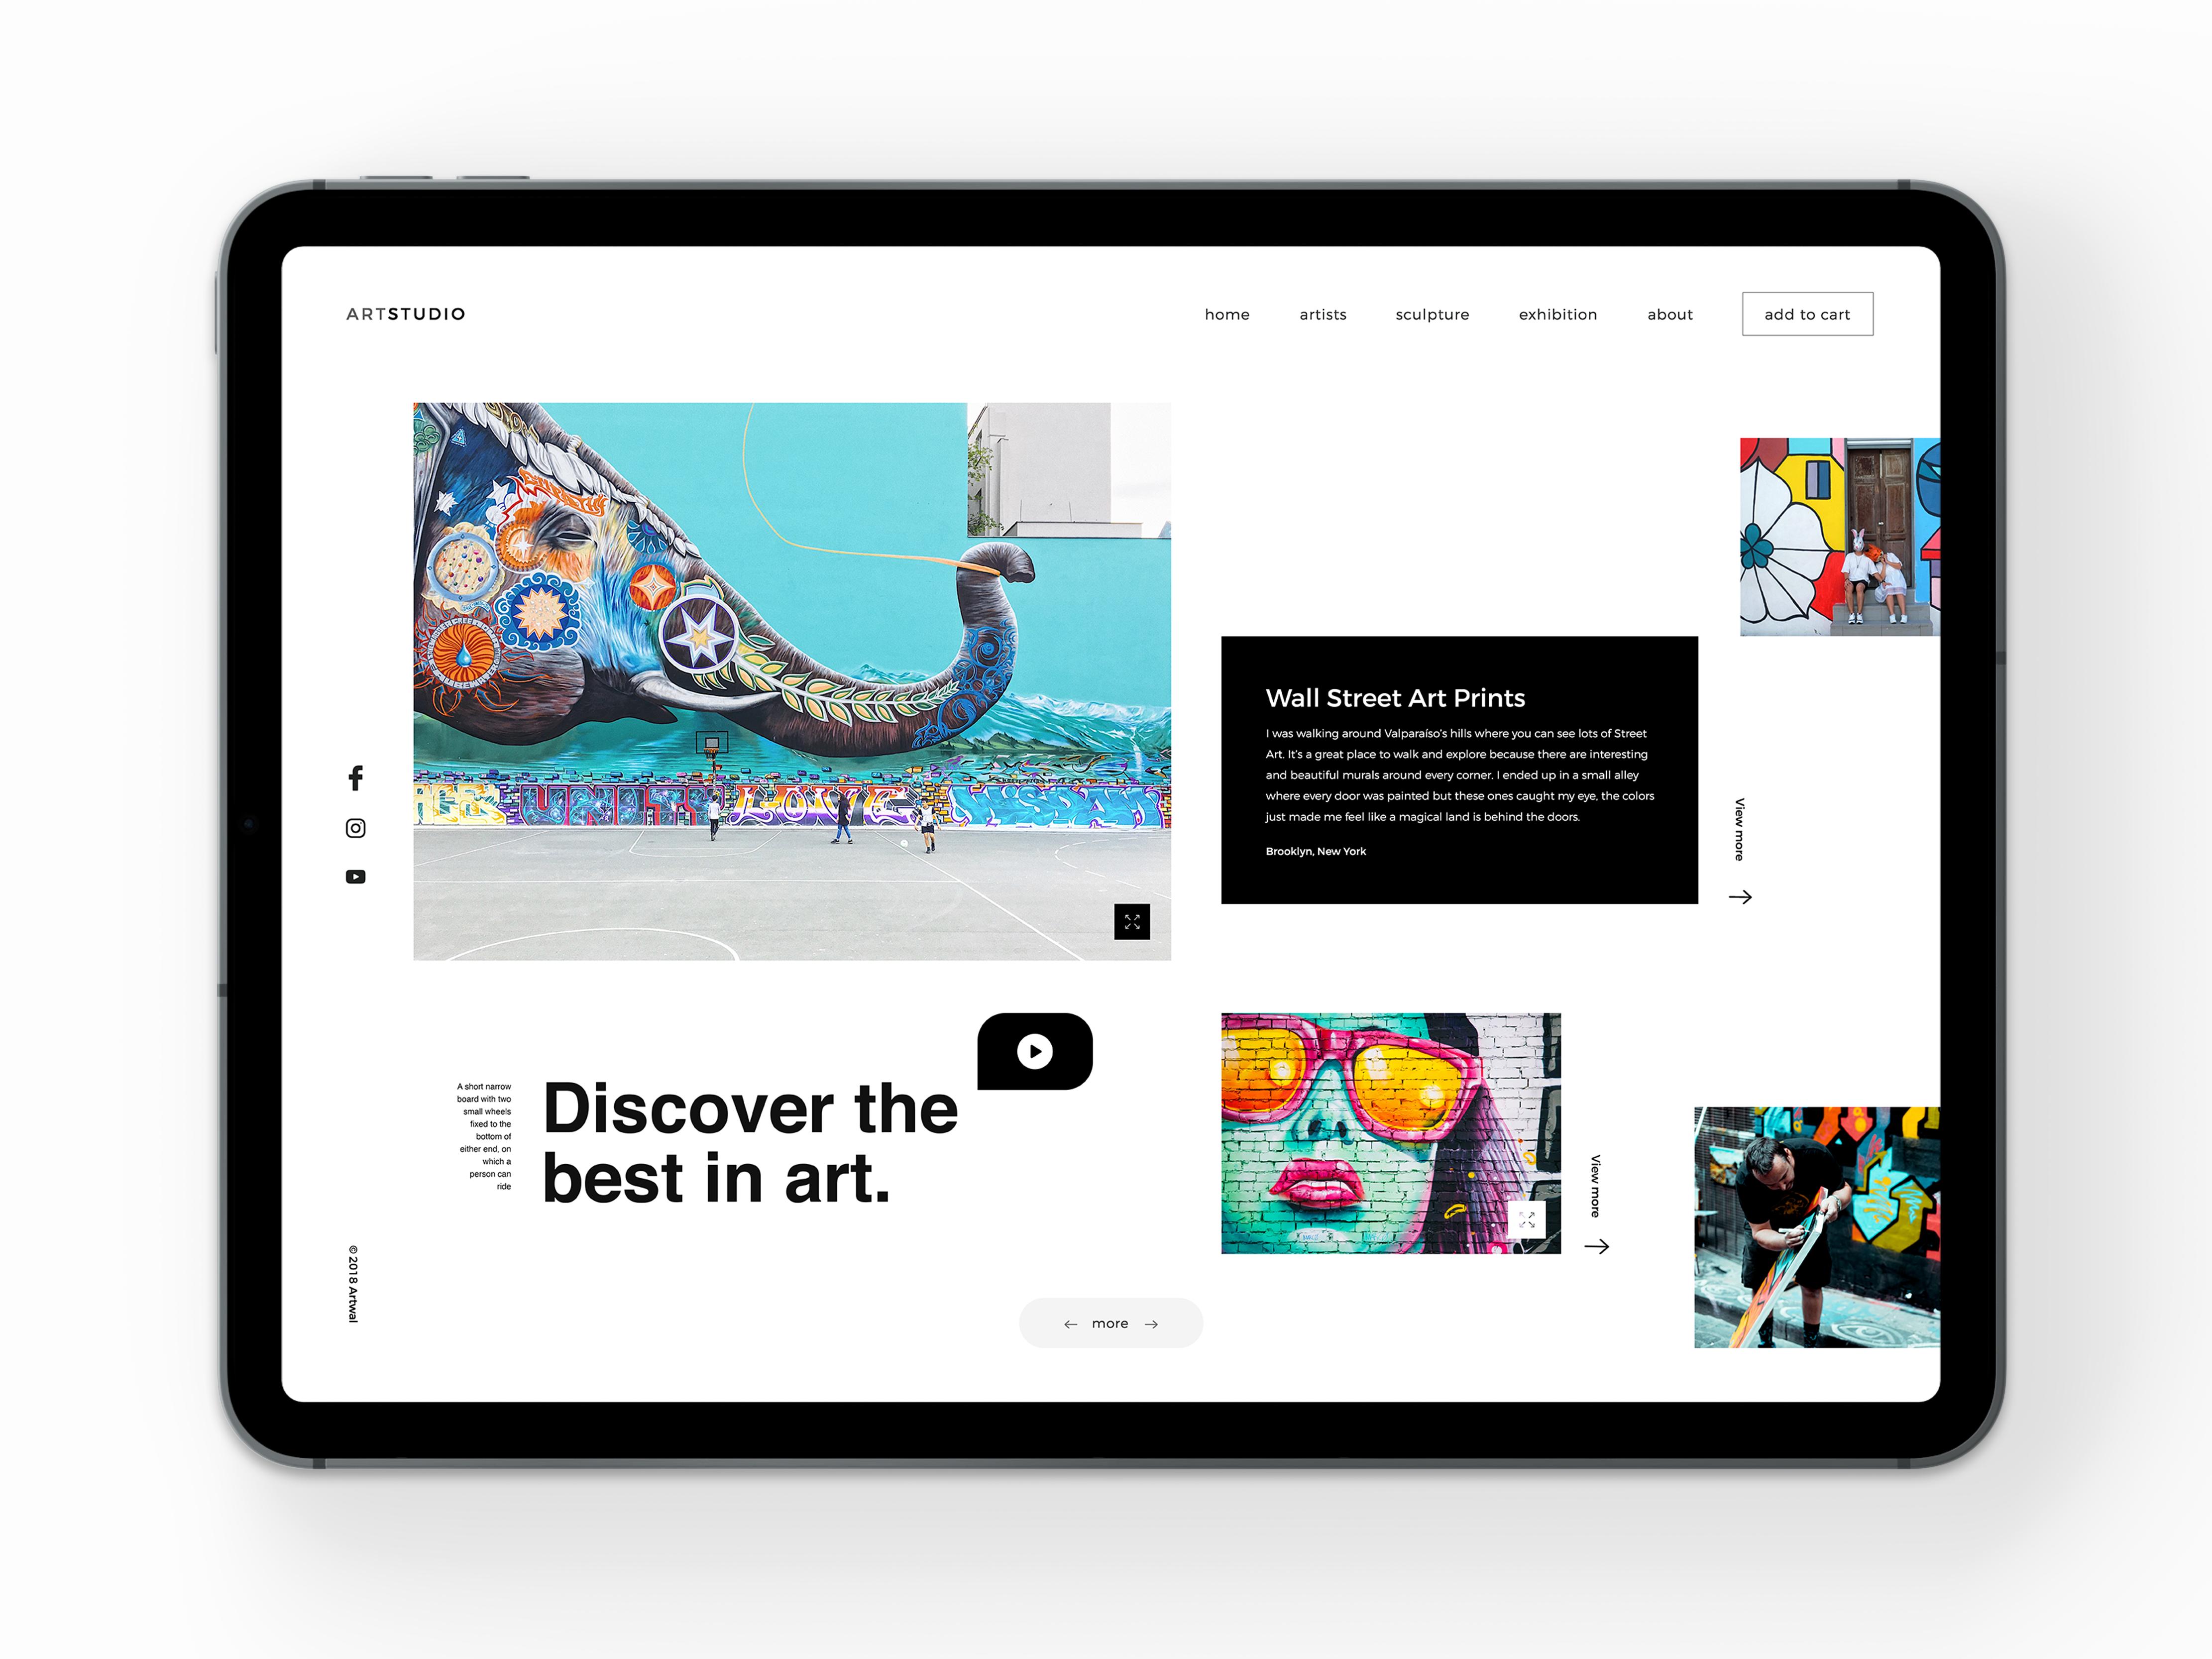 Art Studio Ipad Pro Ipad Pro Art Ipad Pro Art Studio